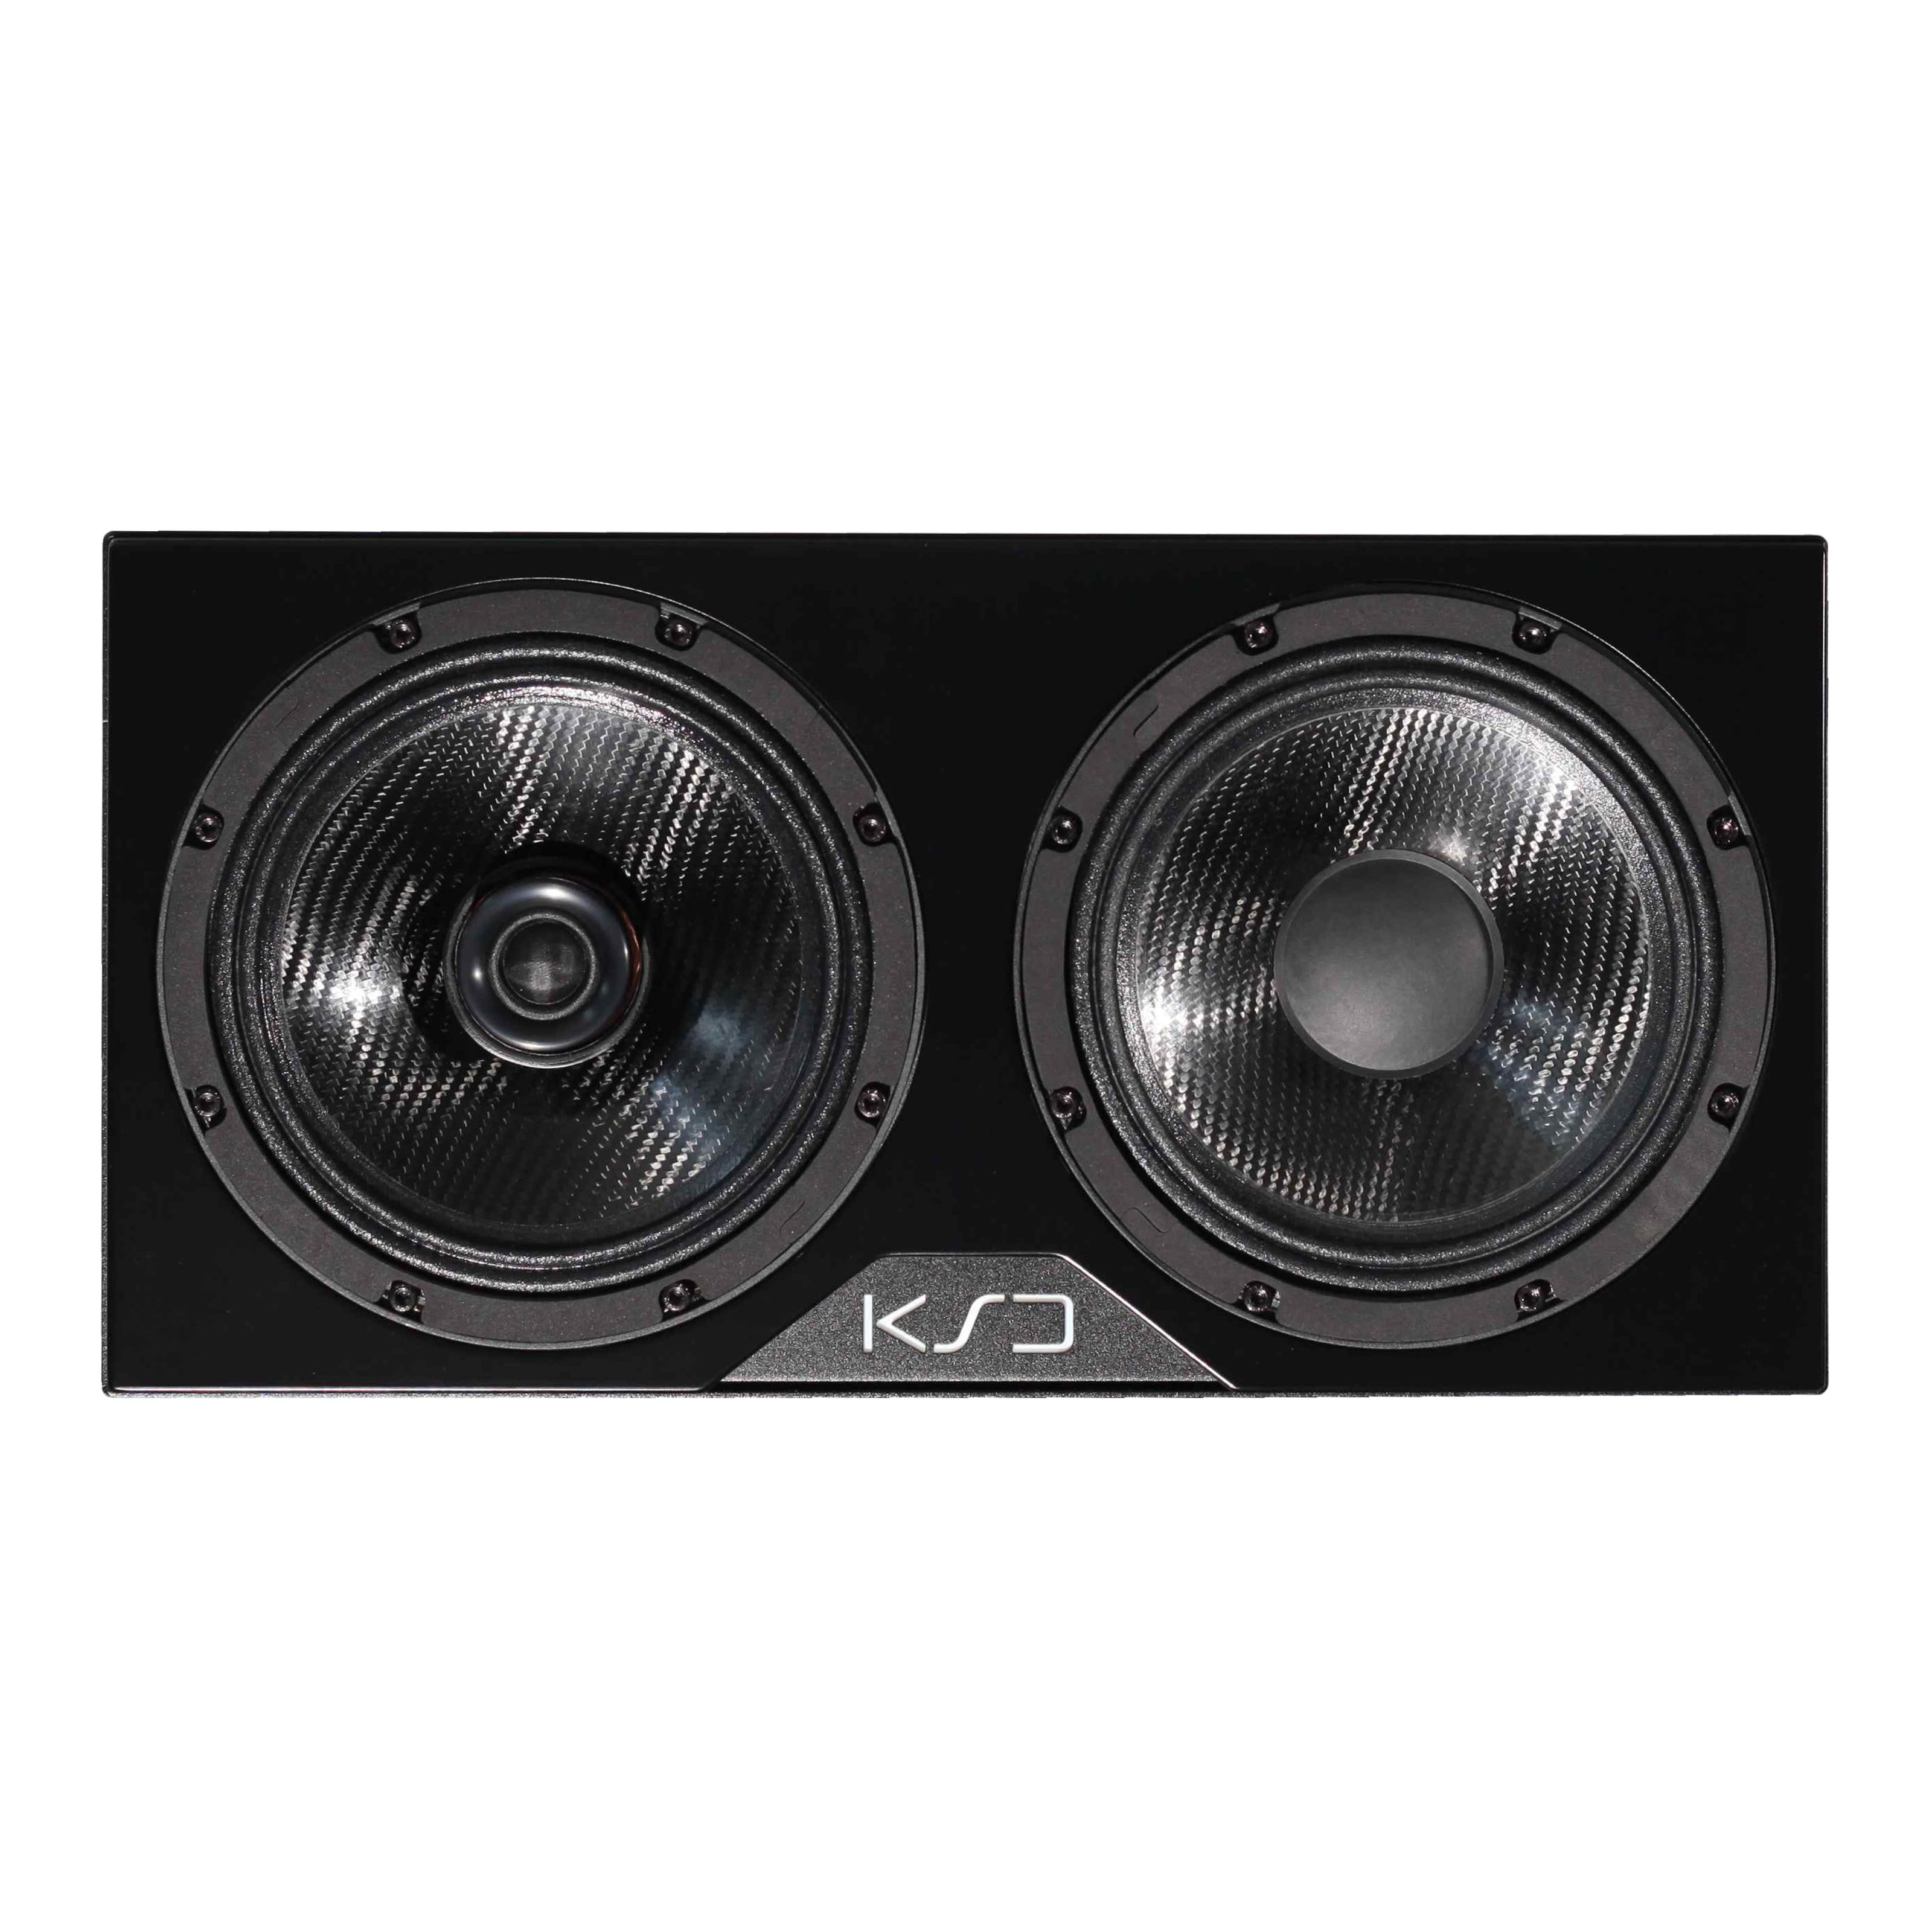 KS-Digital - C88-Reference Black Monitor L 312 left